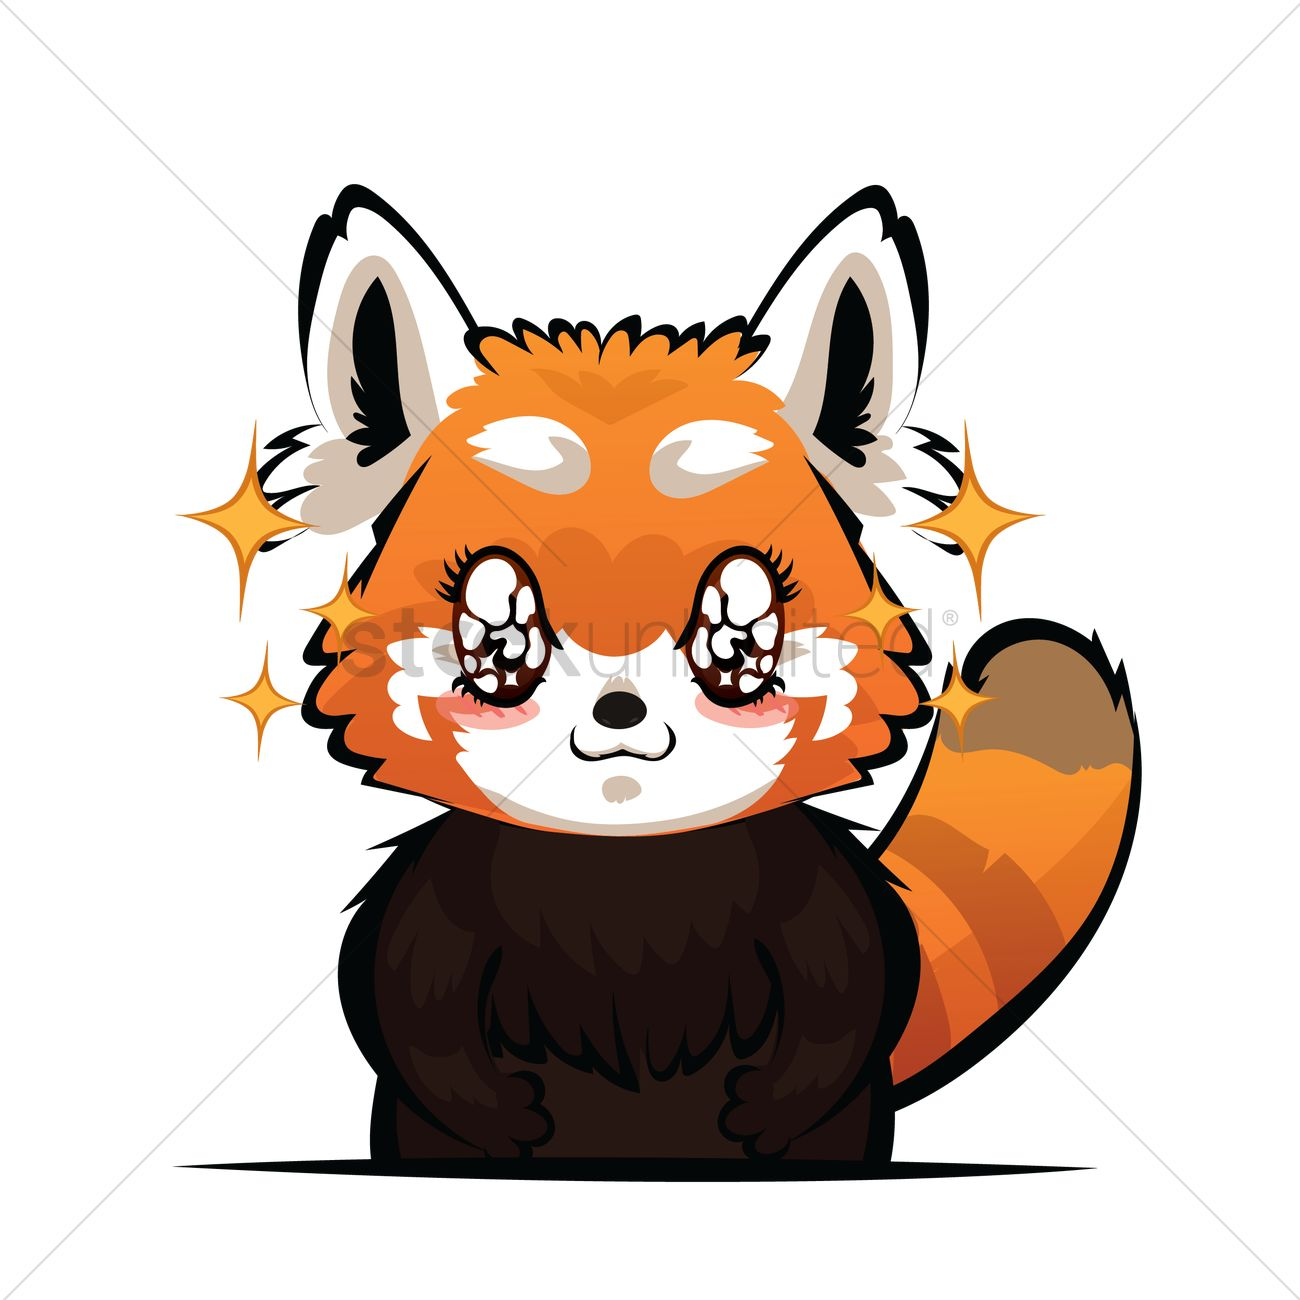 Cartoon red panda with sparkling eyes vector image 9 clip art